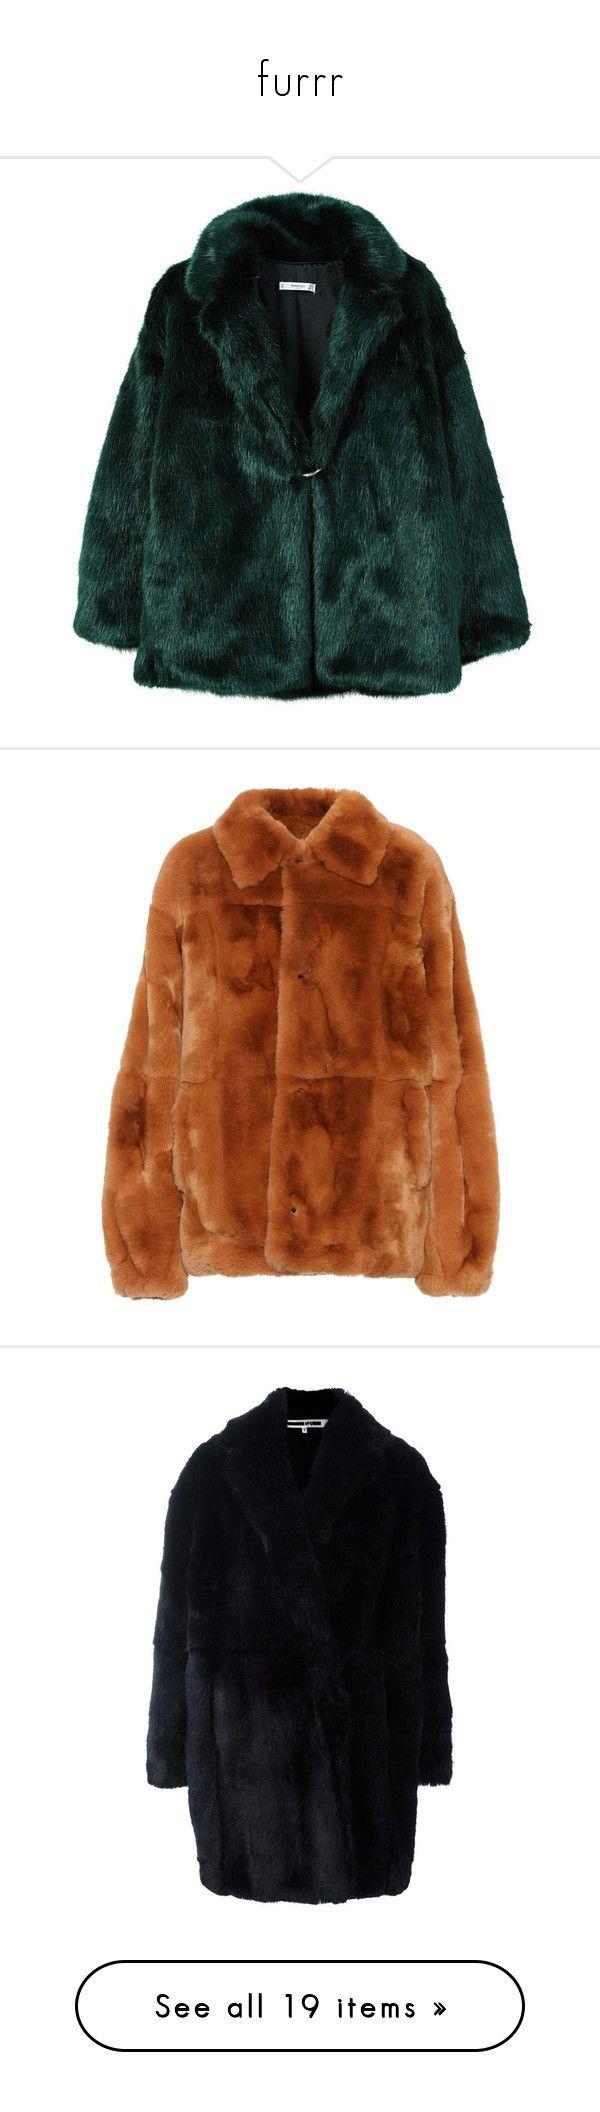 """furrr"" by getrygeya ❤ liked on Polyvore featuring outerwear, coats, jackets, tops, fur jackets, faux fur coat, fur-lined coats, emerald green coat, mango coats and green faux fur coat"